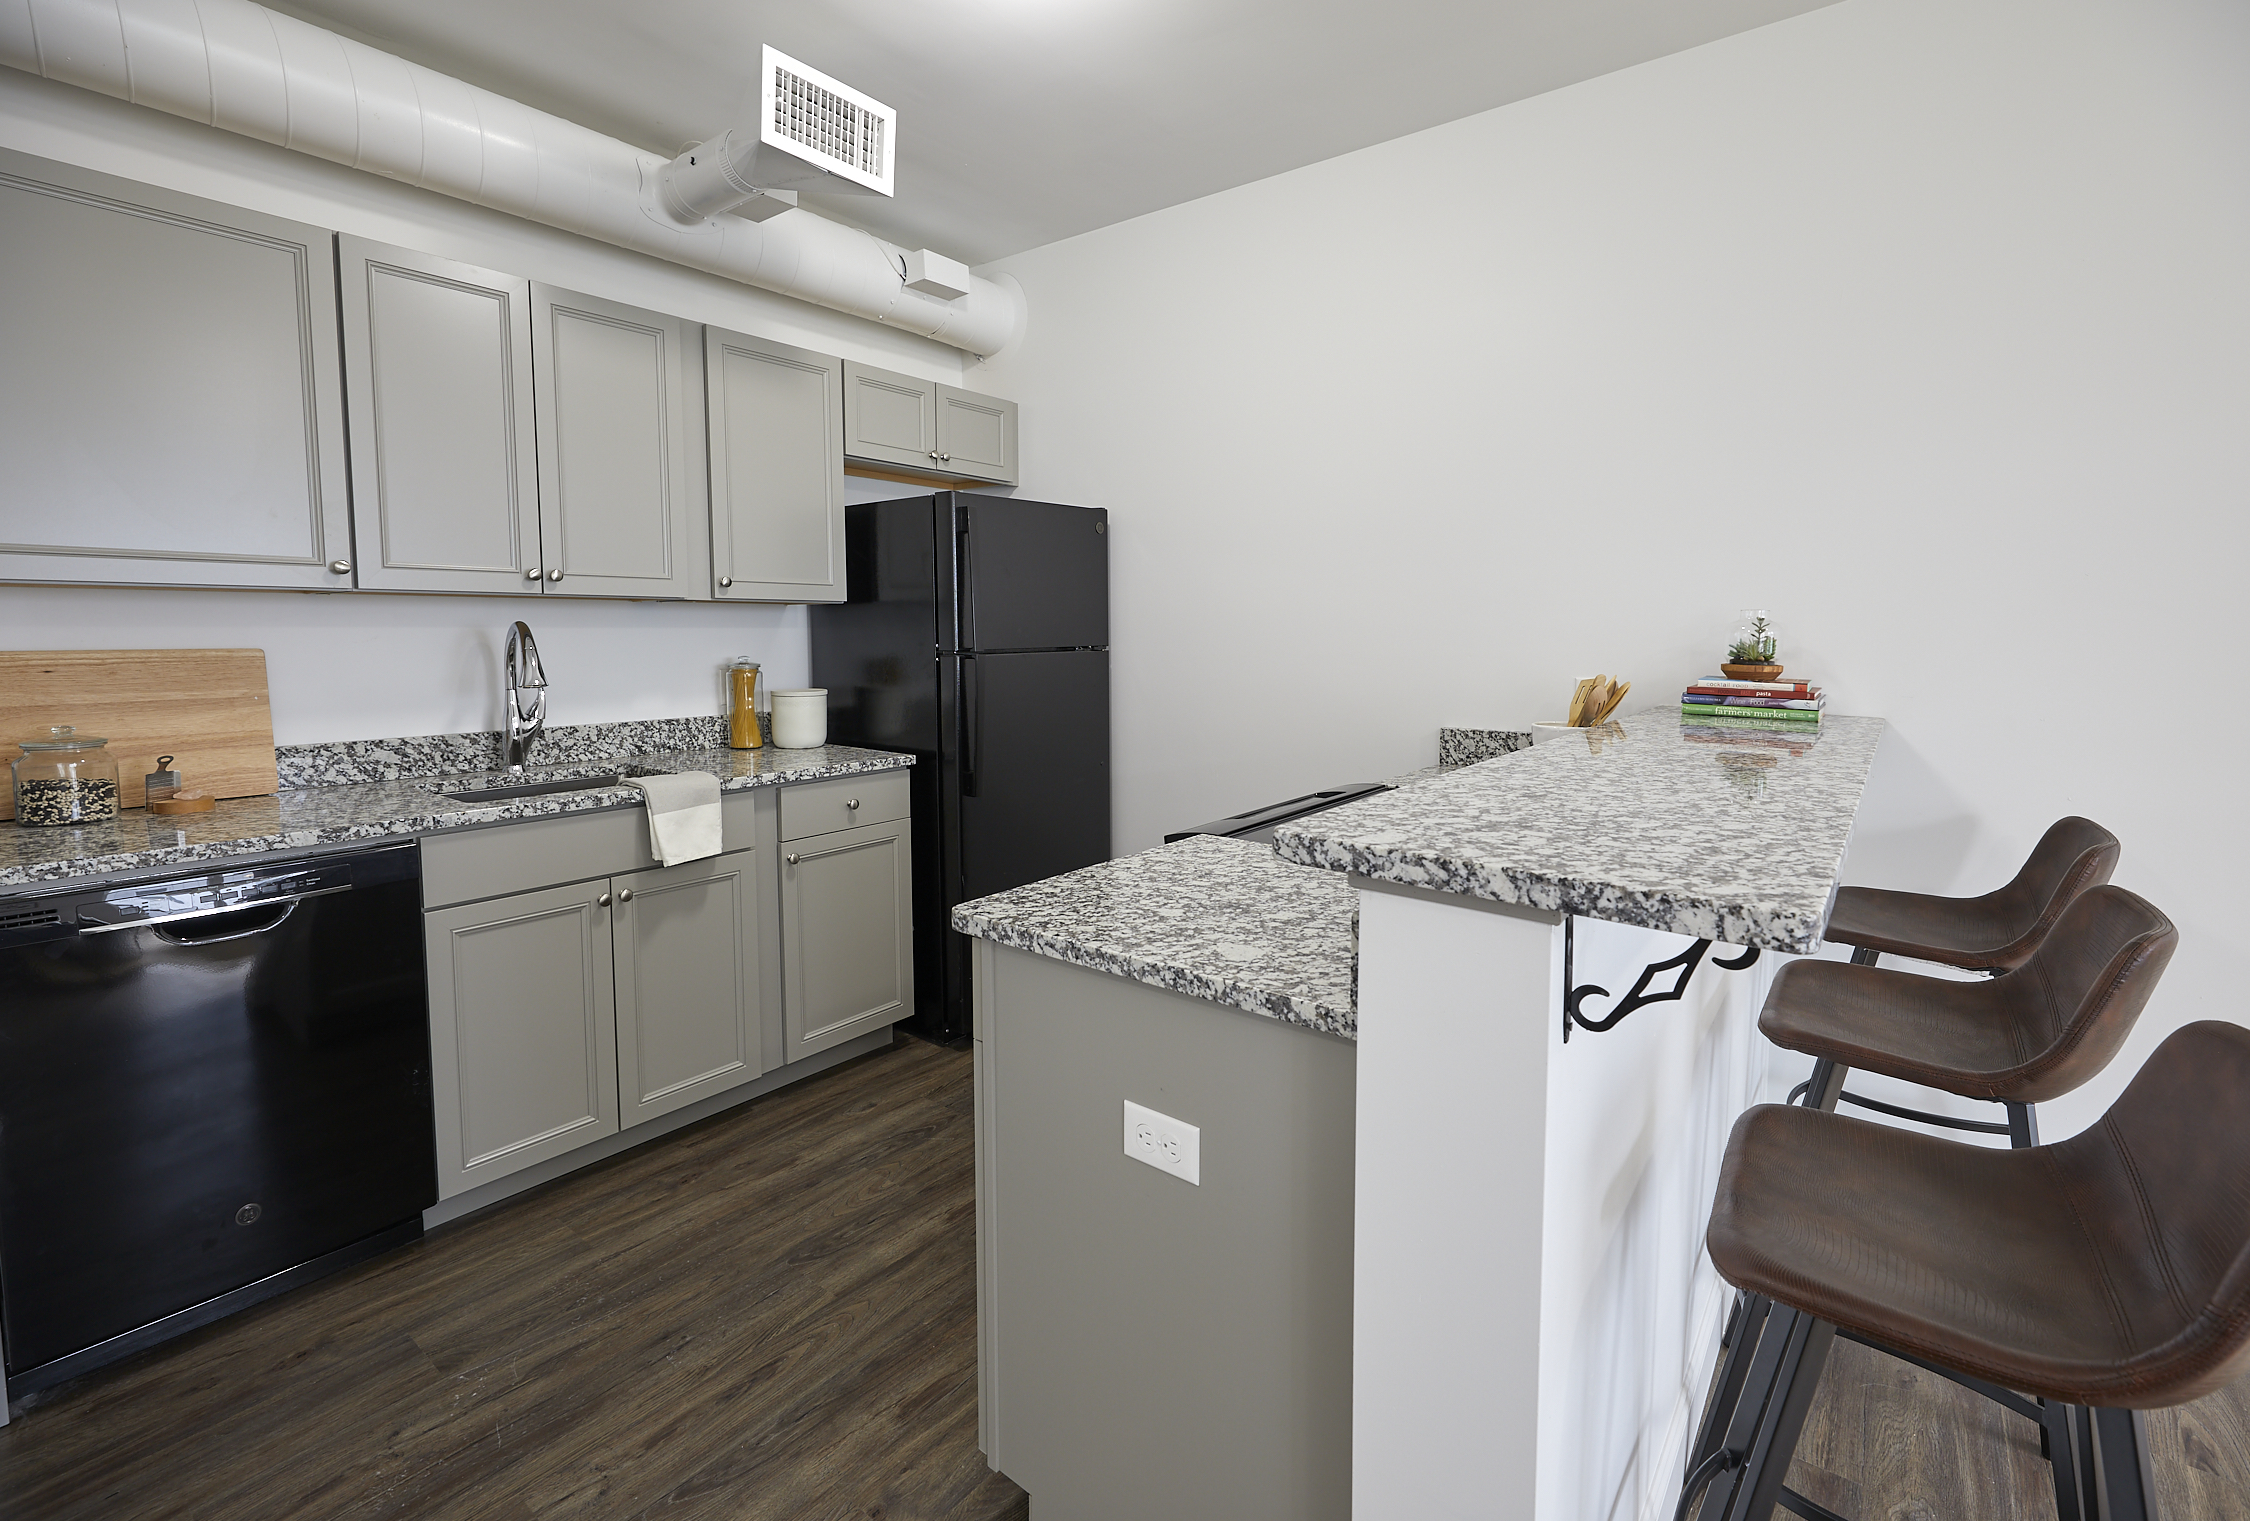 132 Marginal Way – The Linden – Apartment 213  **Open Concept! City Views! New Remodel!**